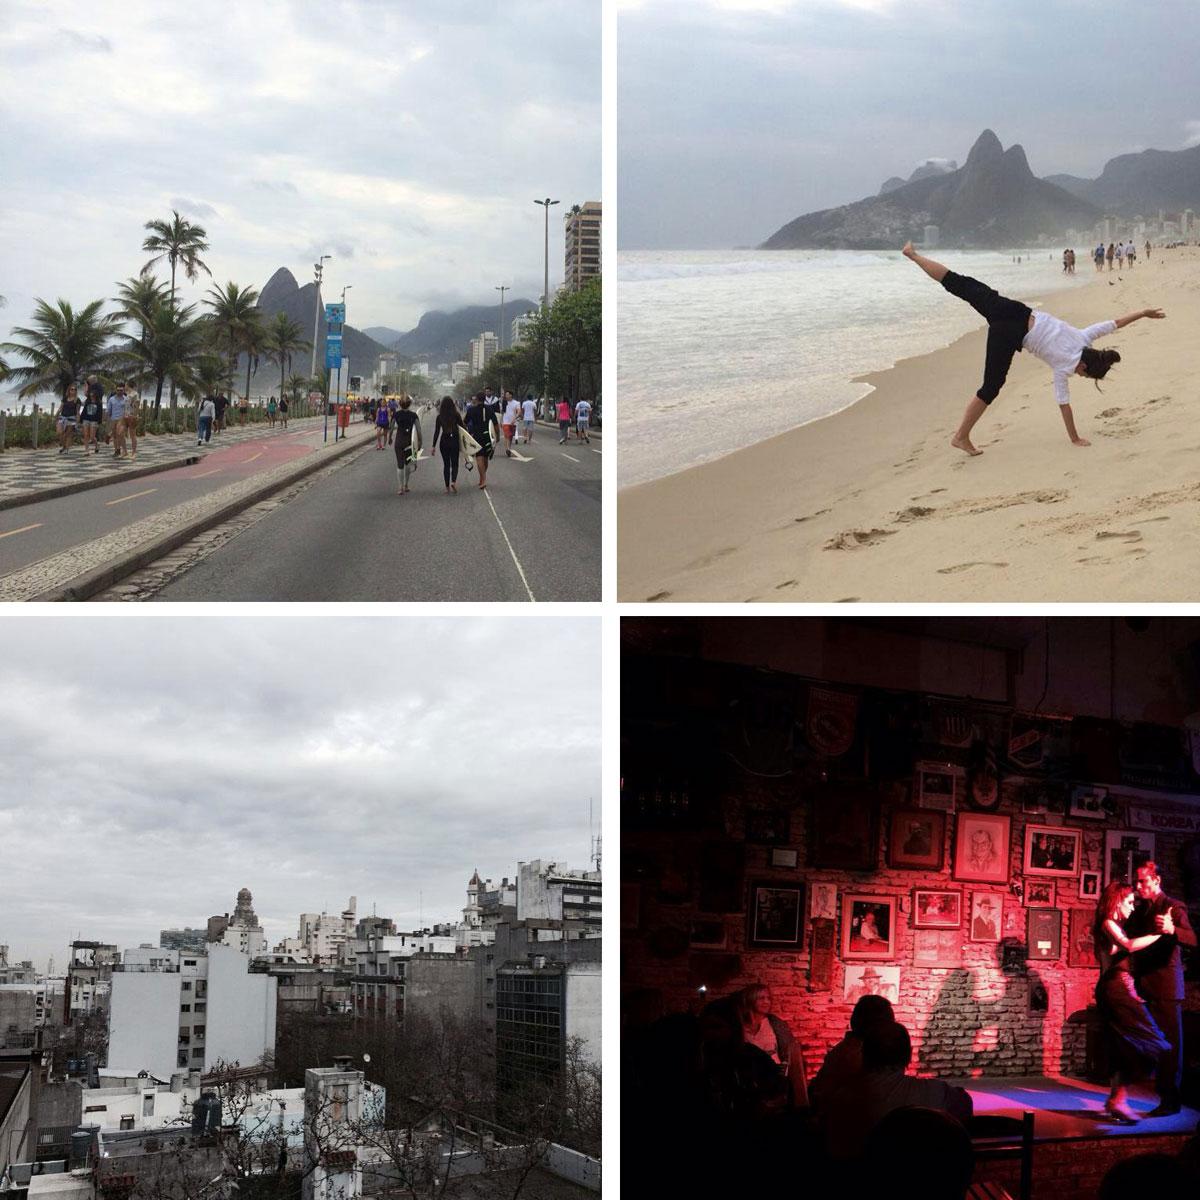 viaje-empresarial_negobide_unesco_bizkaia_reharq_montevideo_uruguay_tango